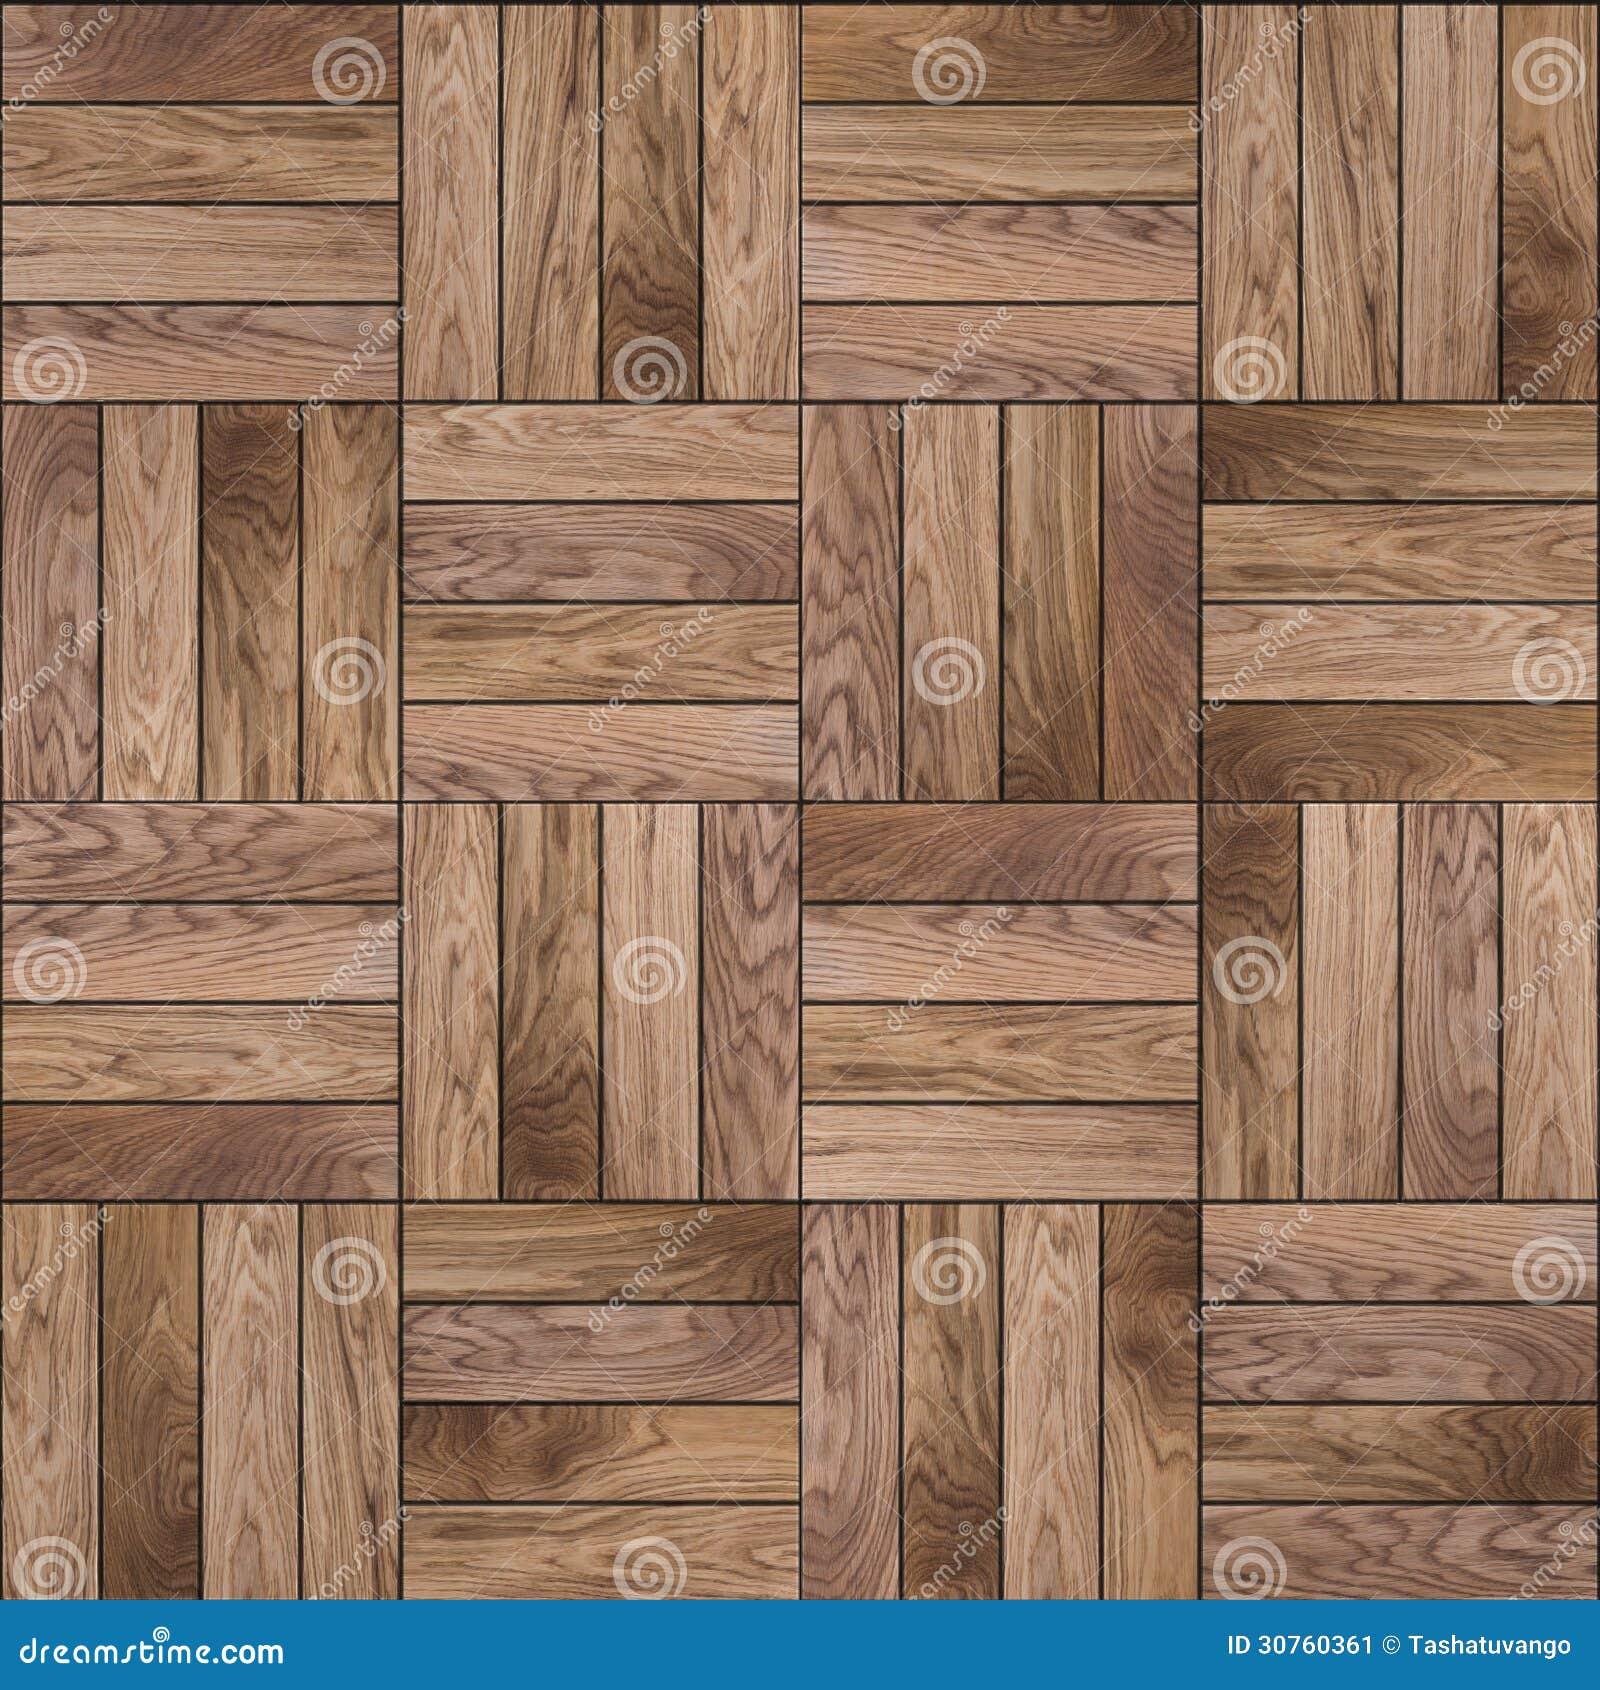 wood parquet floor seamless texture stock image image 30760361. Black Bedroom Furniture Sets. Home Design Ideas